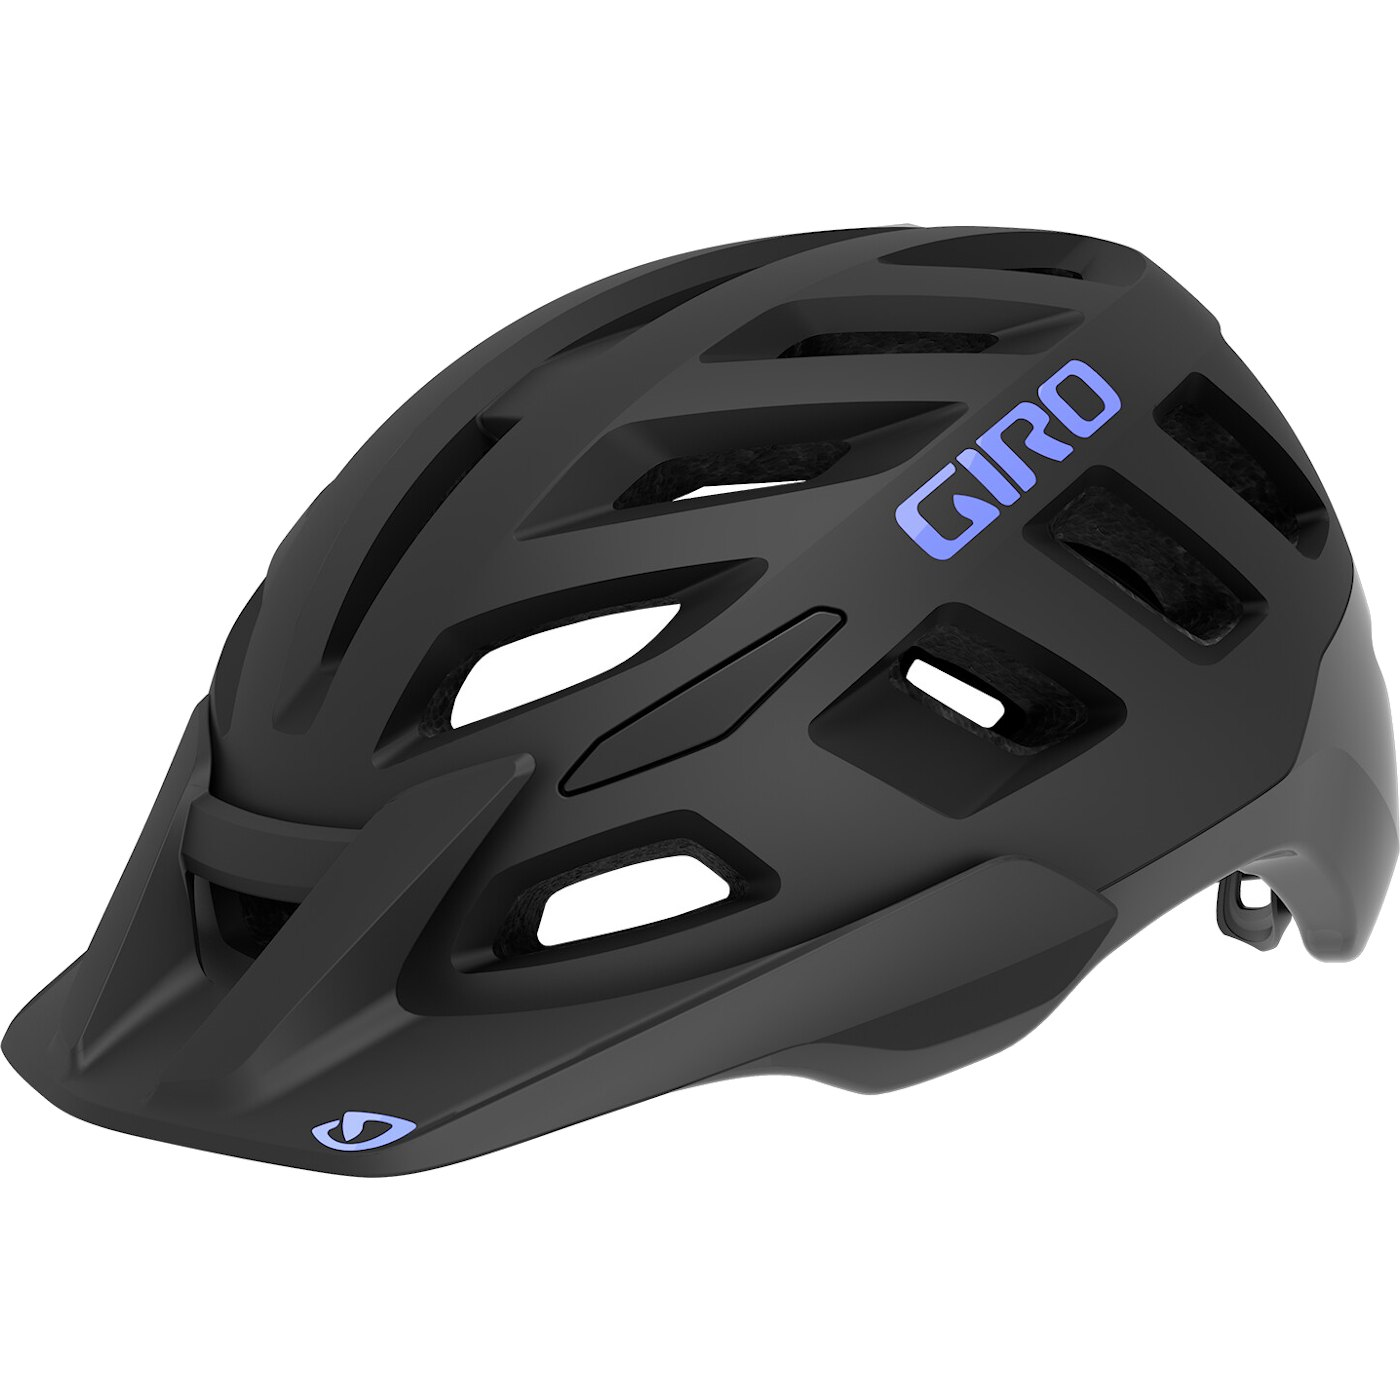 Giro Radix Women's Helmet - matte black / electric purple